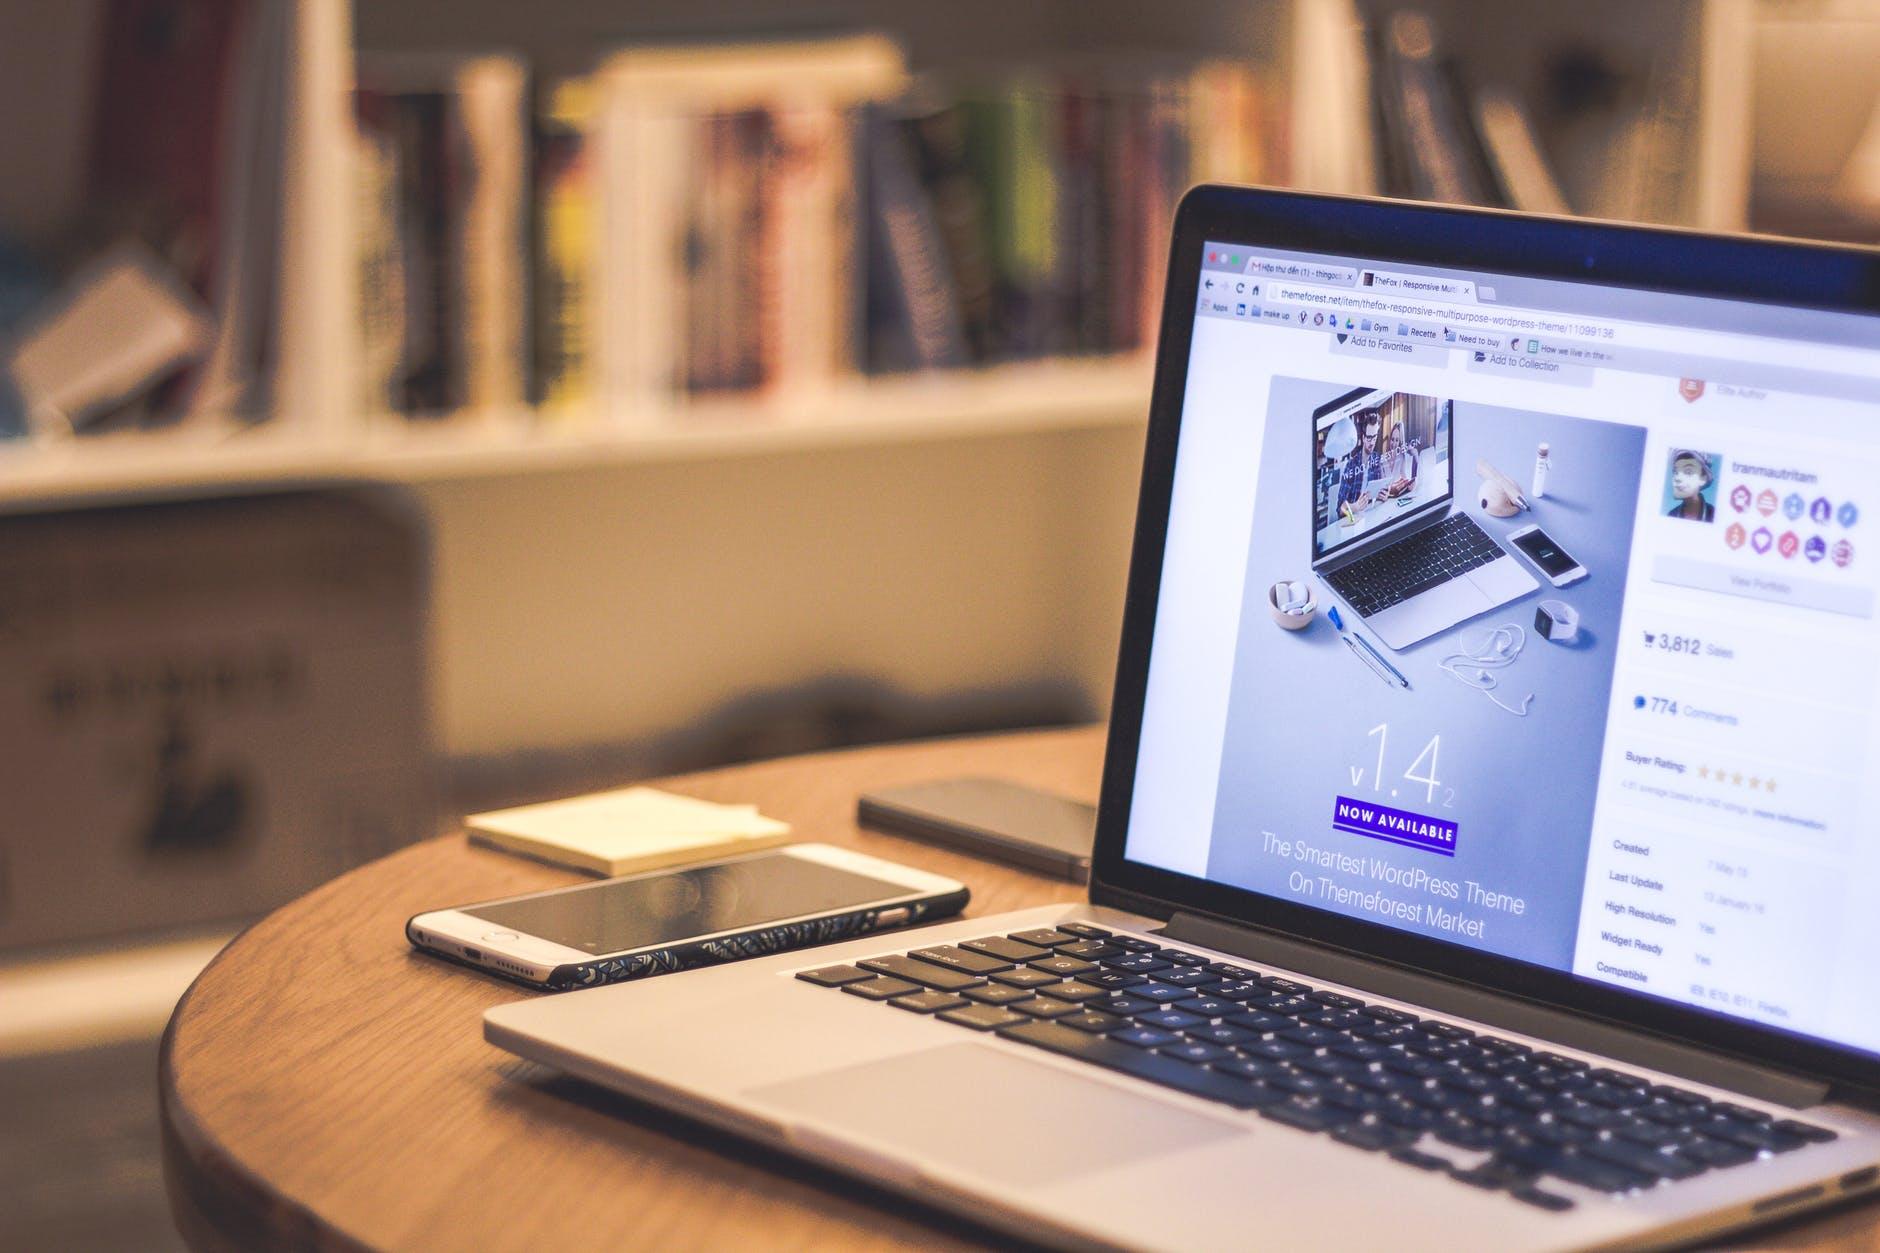 Some Killer Web Design Tips to Improve Your Website